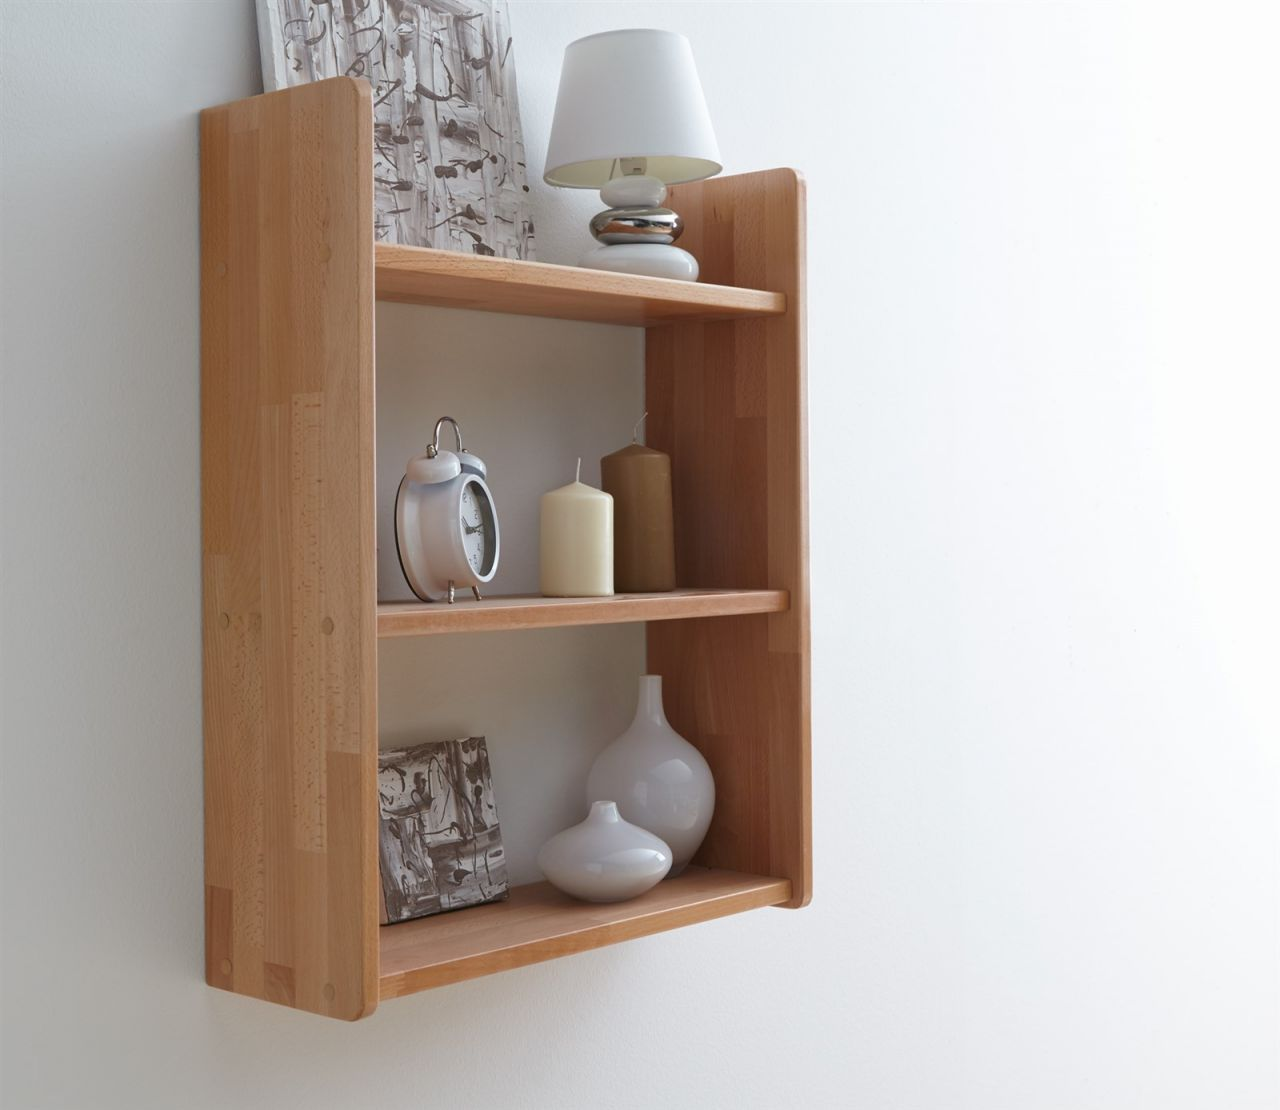 wandregal b cherregal awel nr 3 60x74 cm buche massiv ge lt kaufen bei sylwia lesniewska. Black Bedroom Furniture Sets. Home Design Ideas